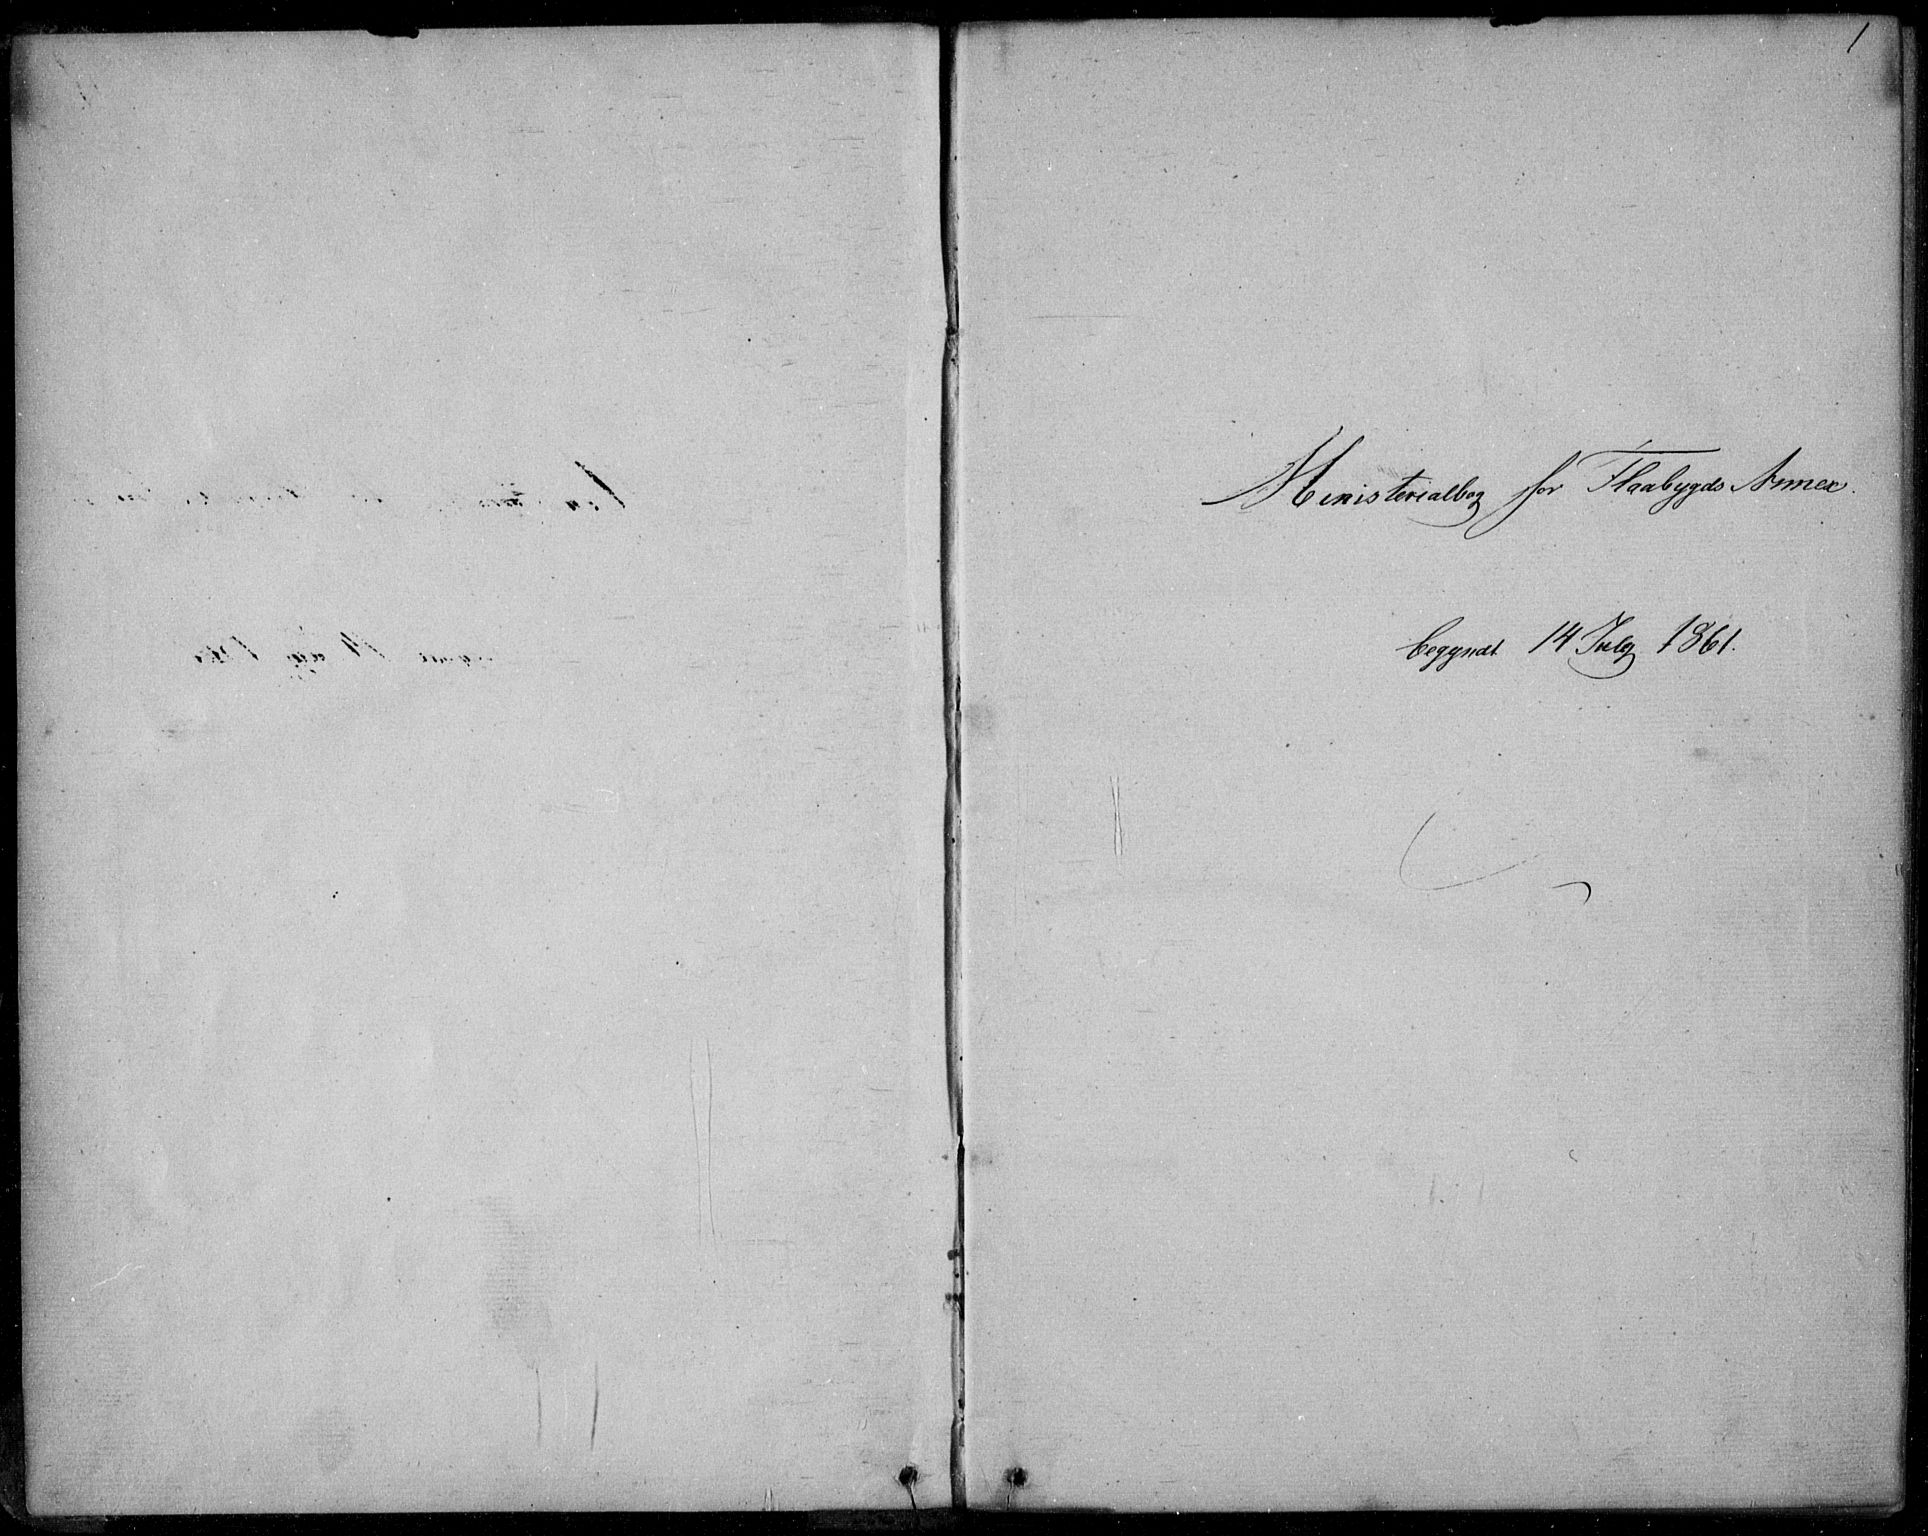 SAKO, Lunde kirkebøker, F/Fb/L0002: Ministerialbok nr. II 2, 1861-1881, s. 1